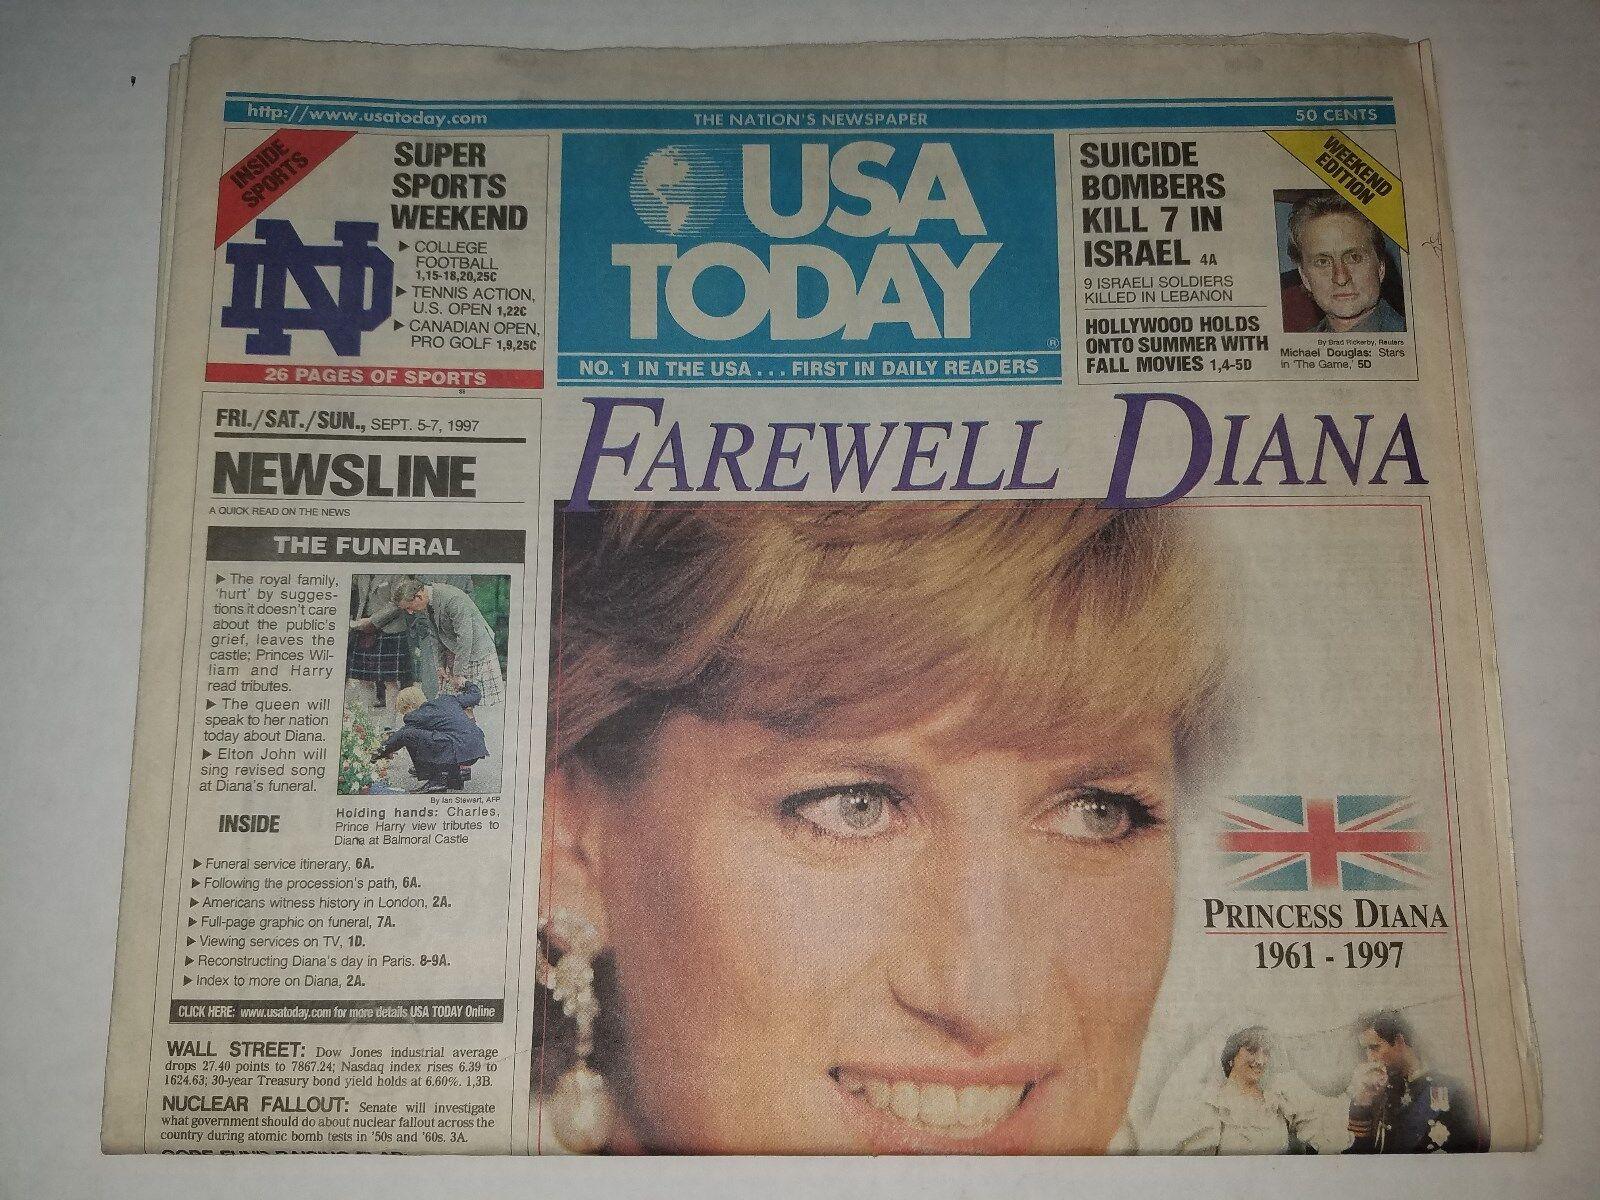 princess diana death newspaper coverage usa today september 5 7 1997 for sale online ebay princess diana death newspaper september 7 1997 usa today funeral edition